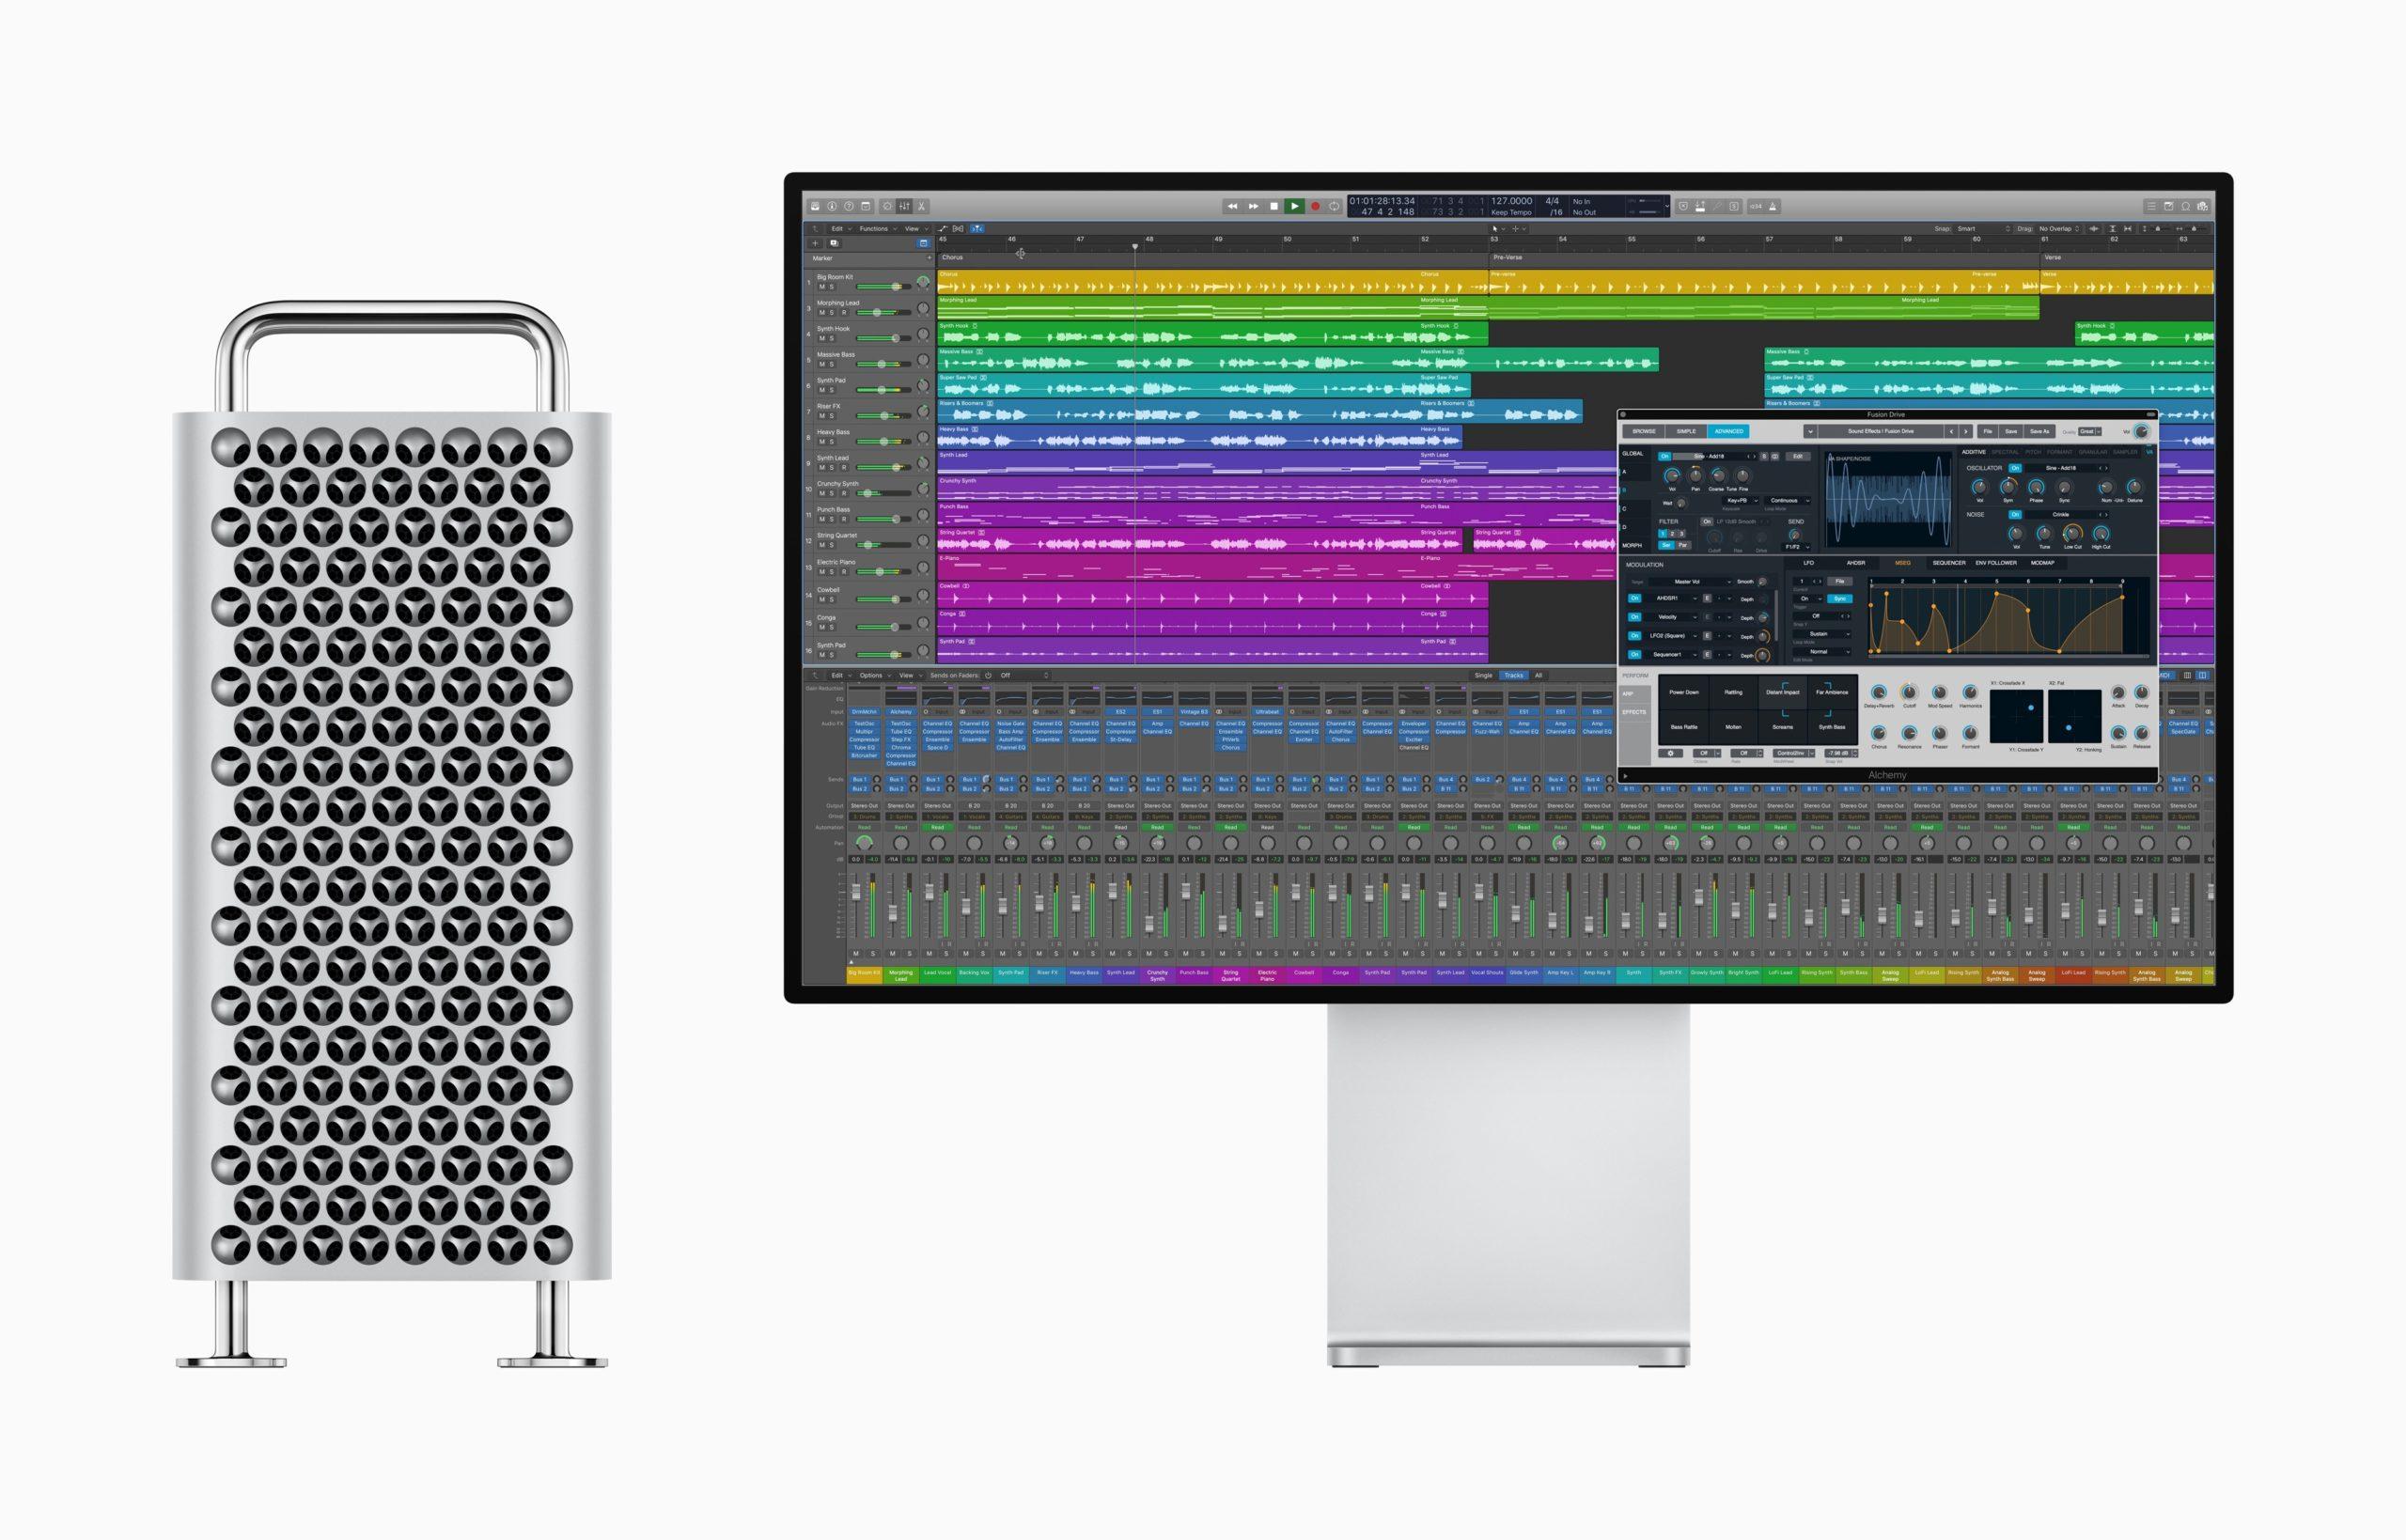 Mac Pro com Pro Display XDR